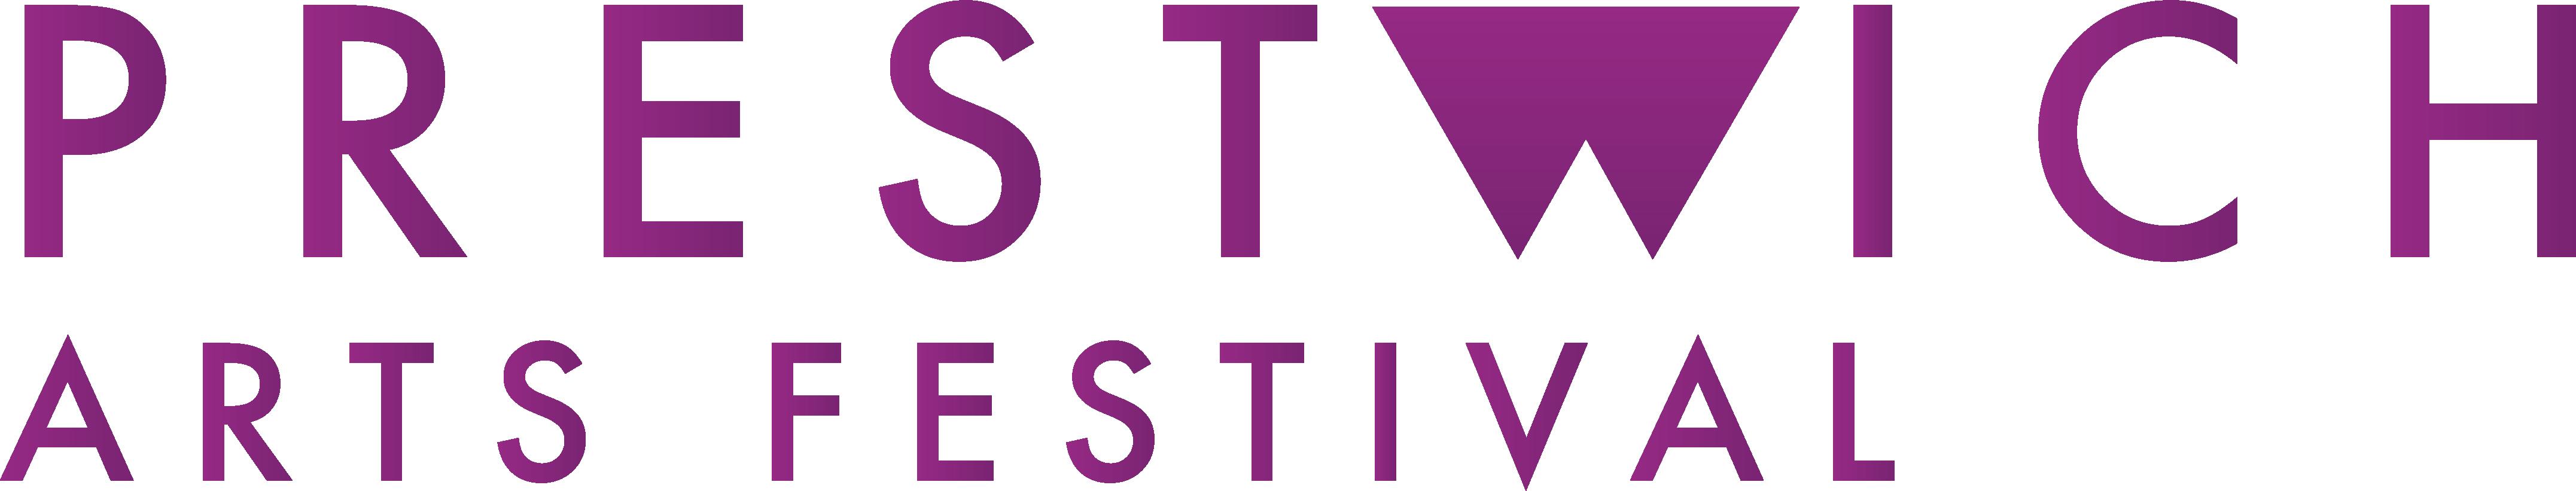 Prestwich Arts Festival Logo